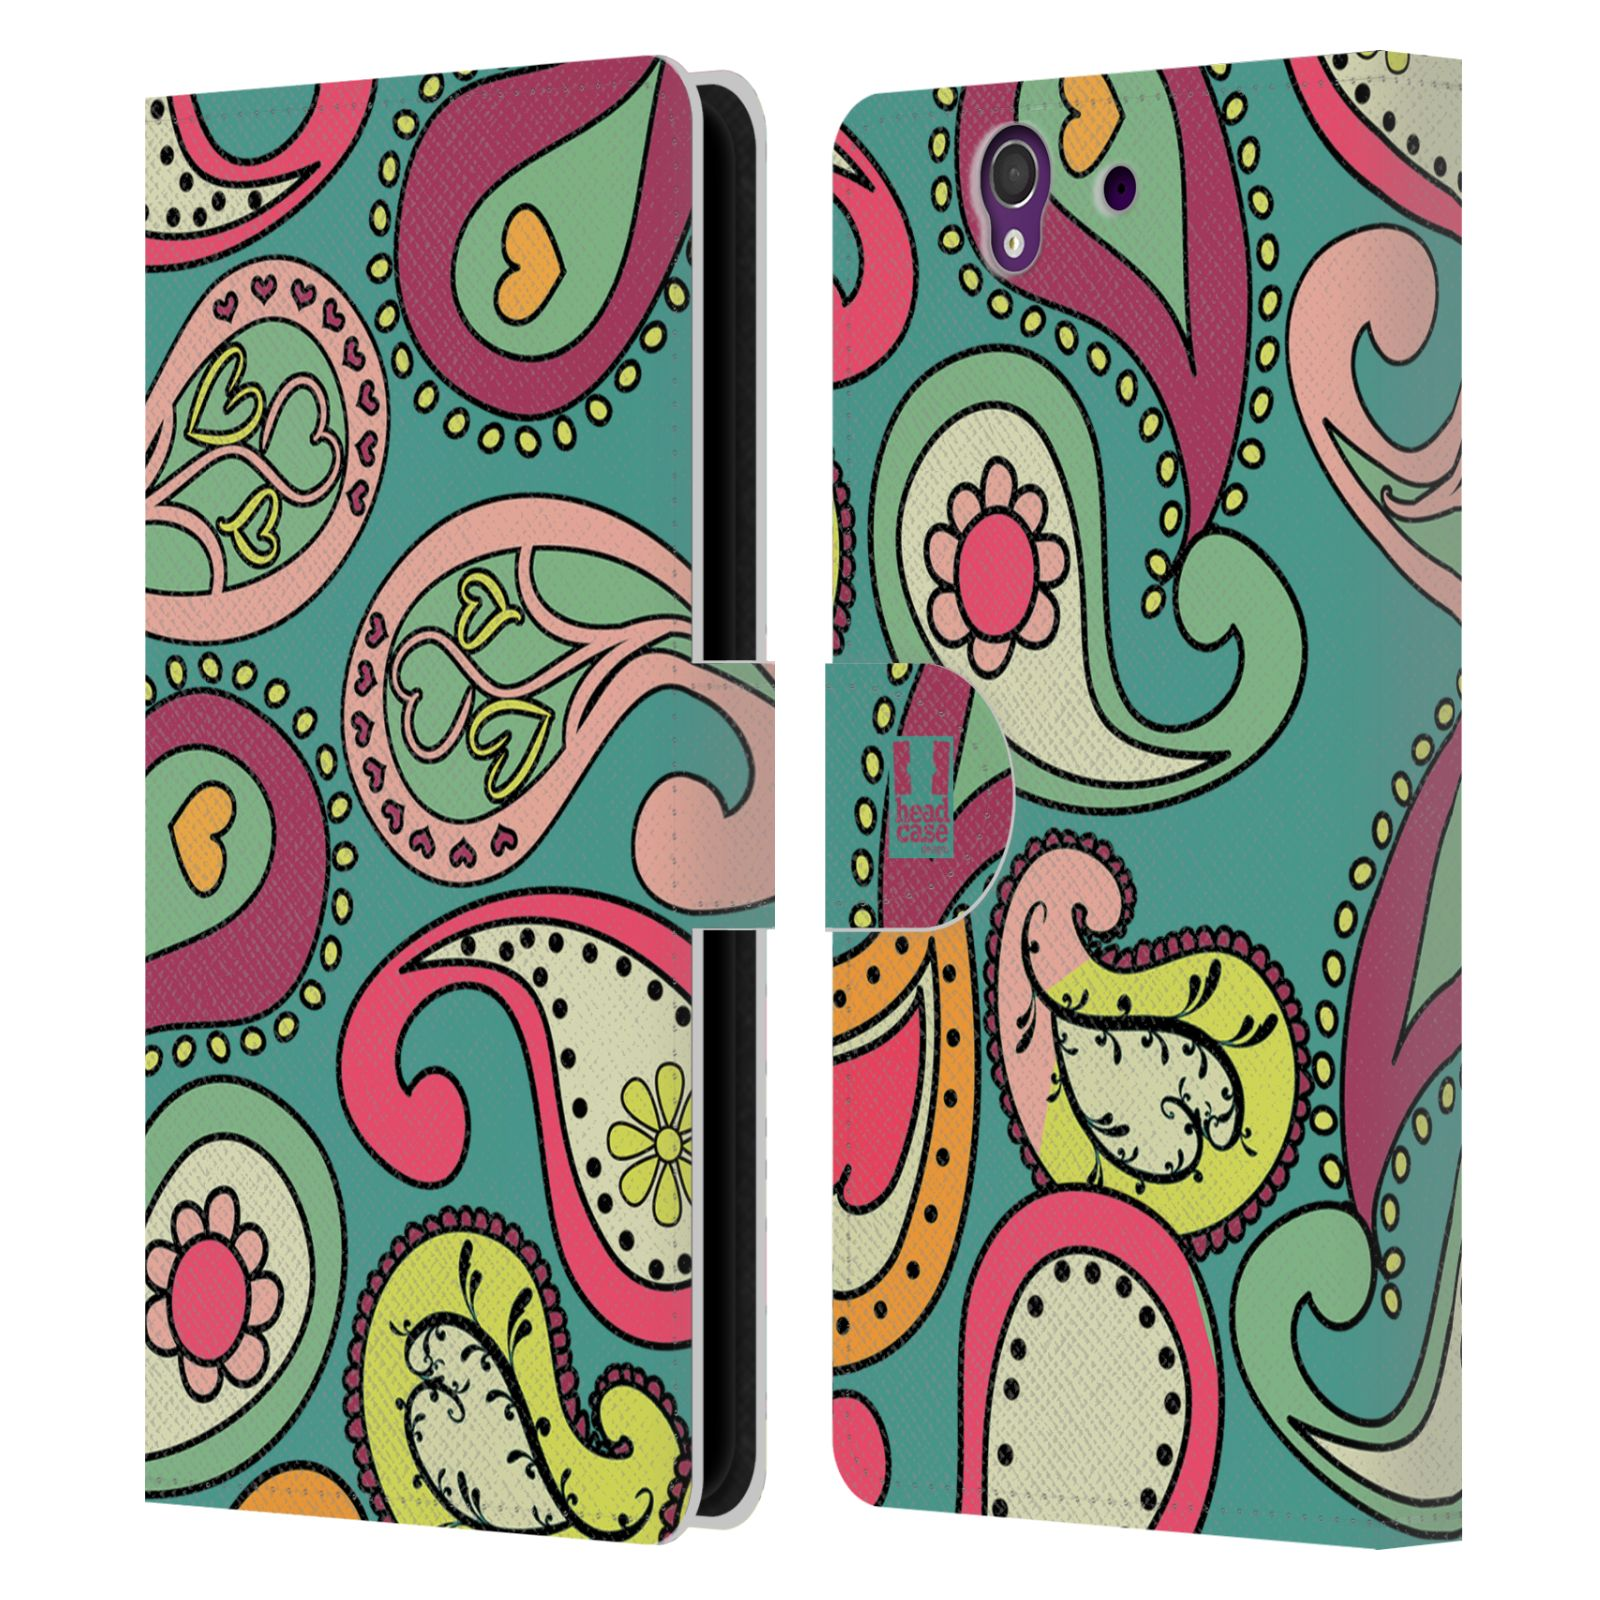 HEAD CASE Flipové pouzdro pro mobil SONY XPERIA Z (C6603) barevné slzy tyrkysová